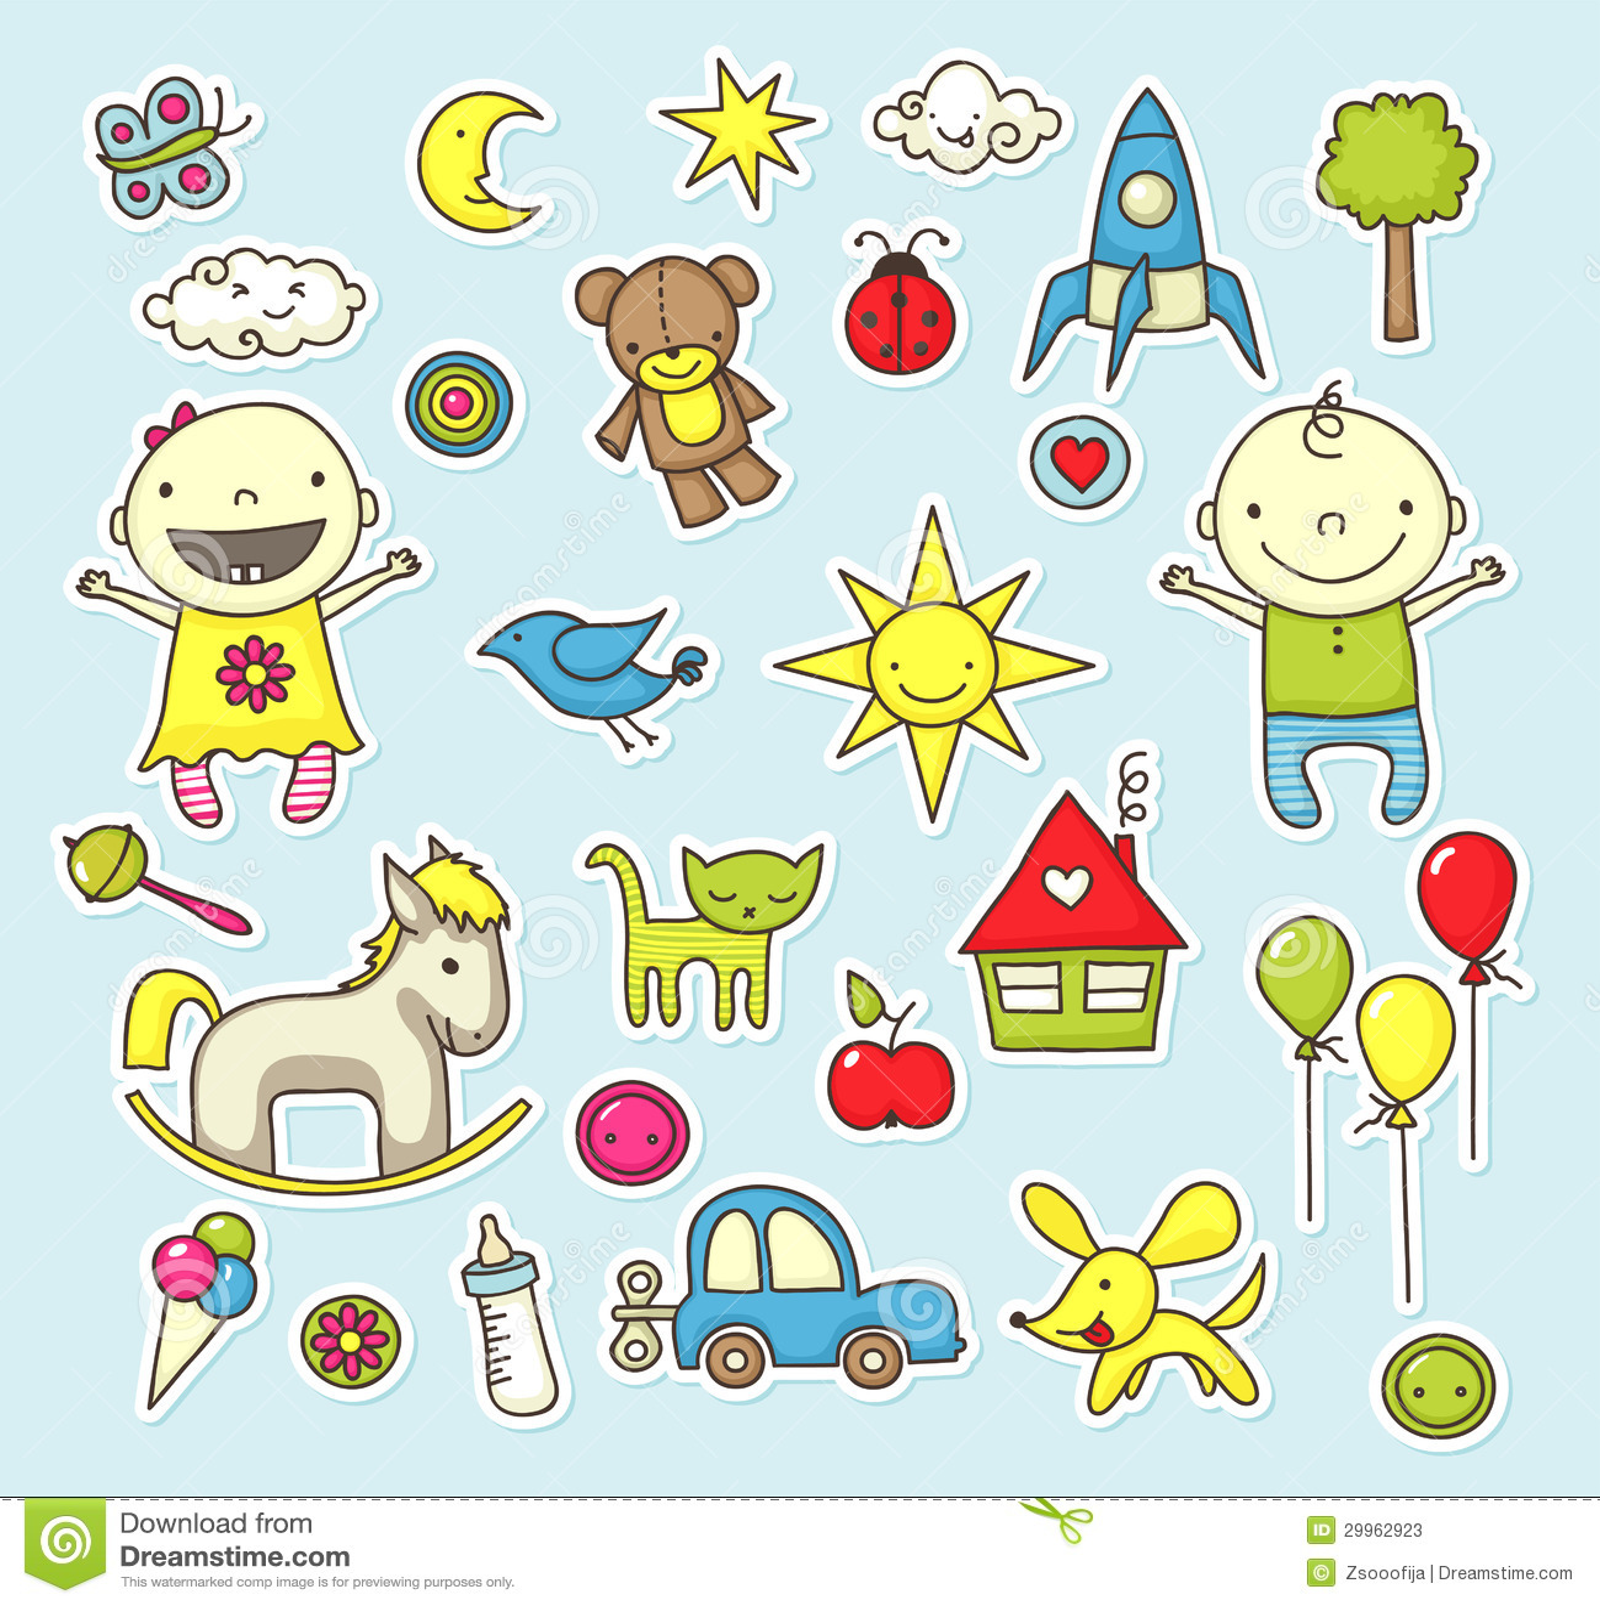 baby stickers stock vector illustration of bear heart 29962923